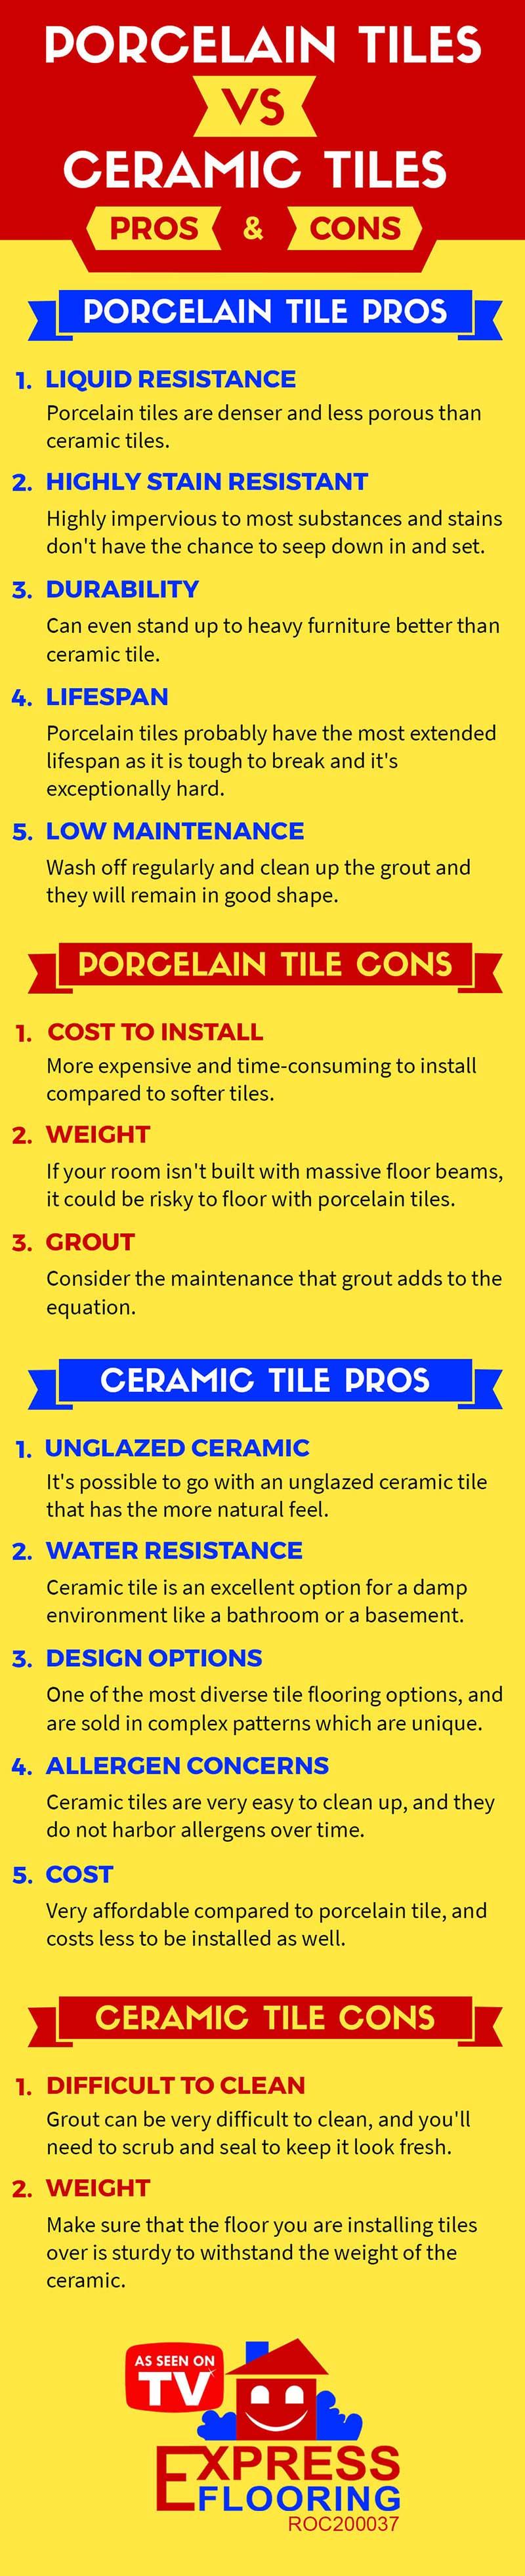 Porcelain Tiles Vs Ceramic Tiles Pros And Cons